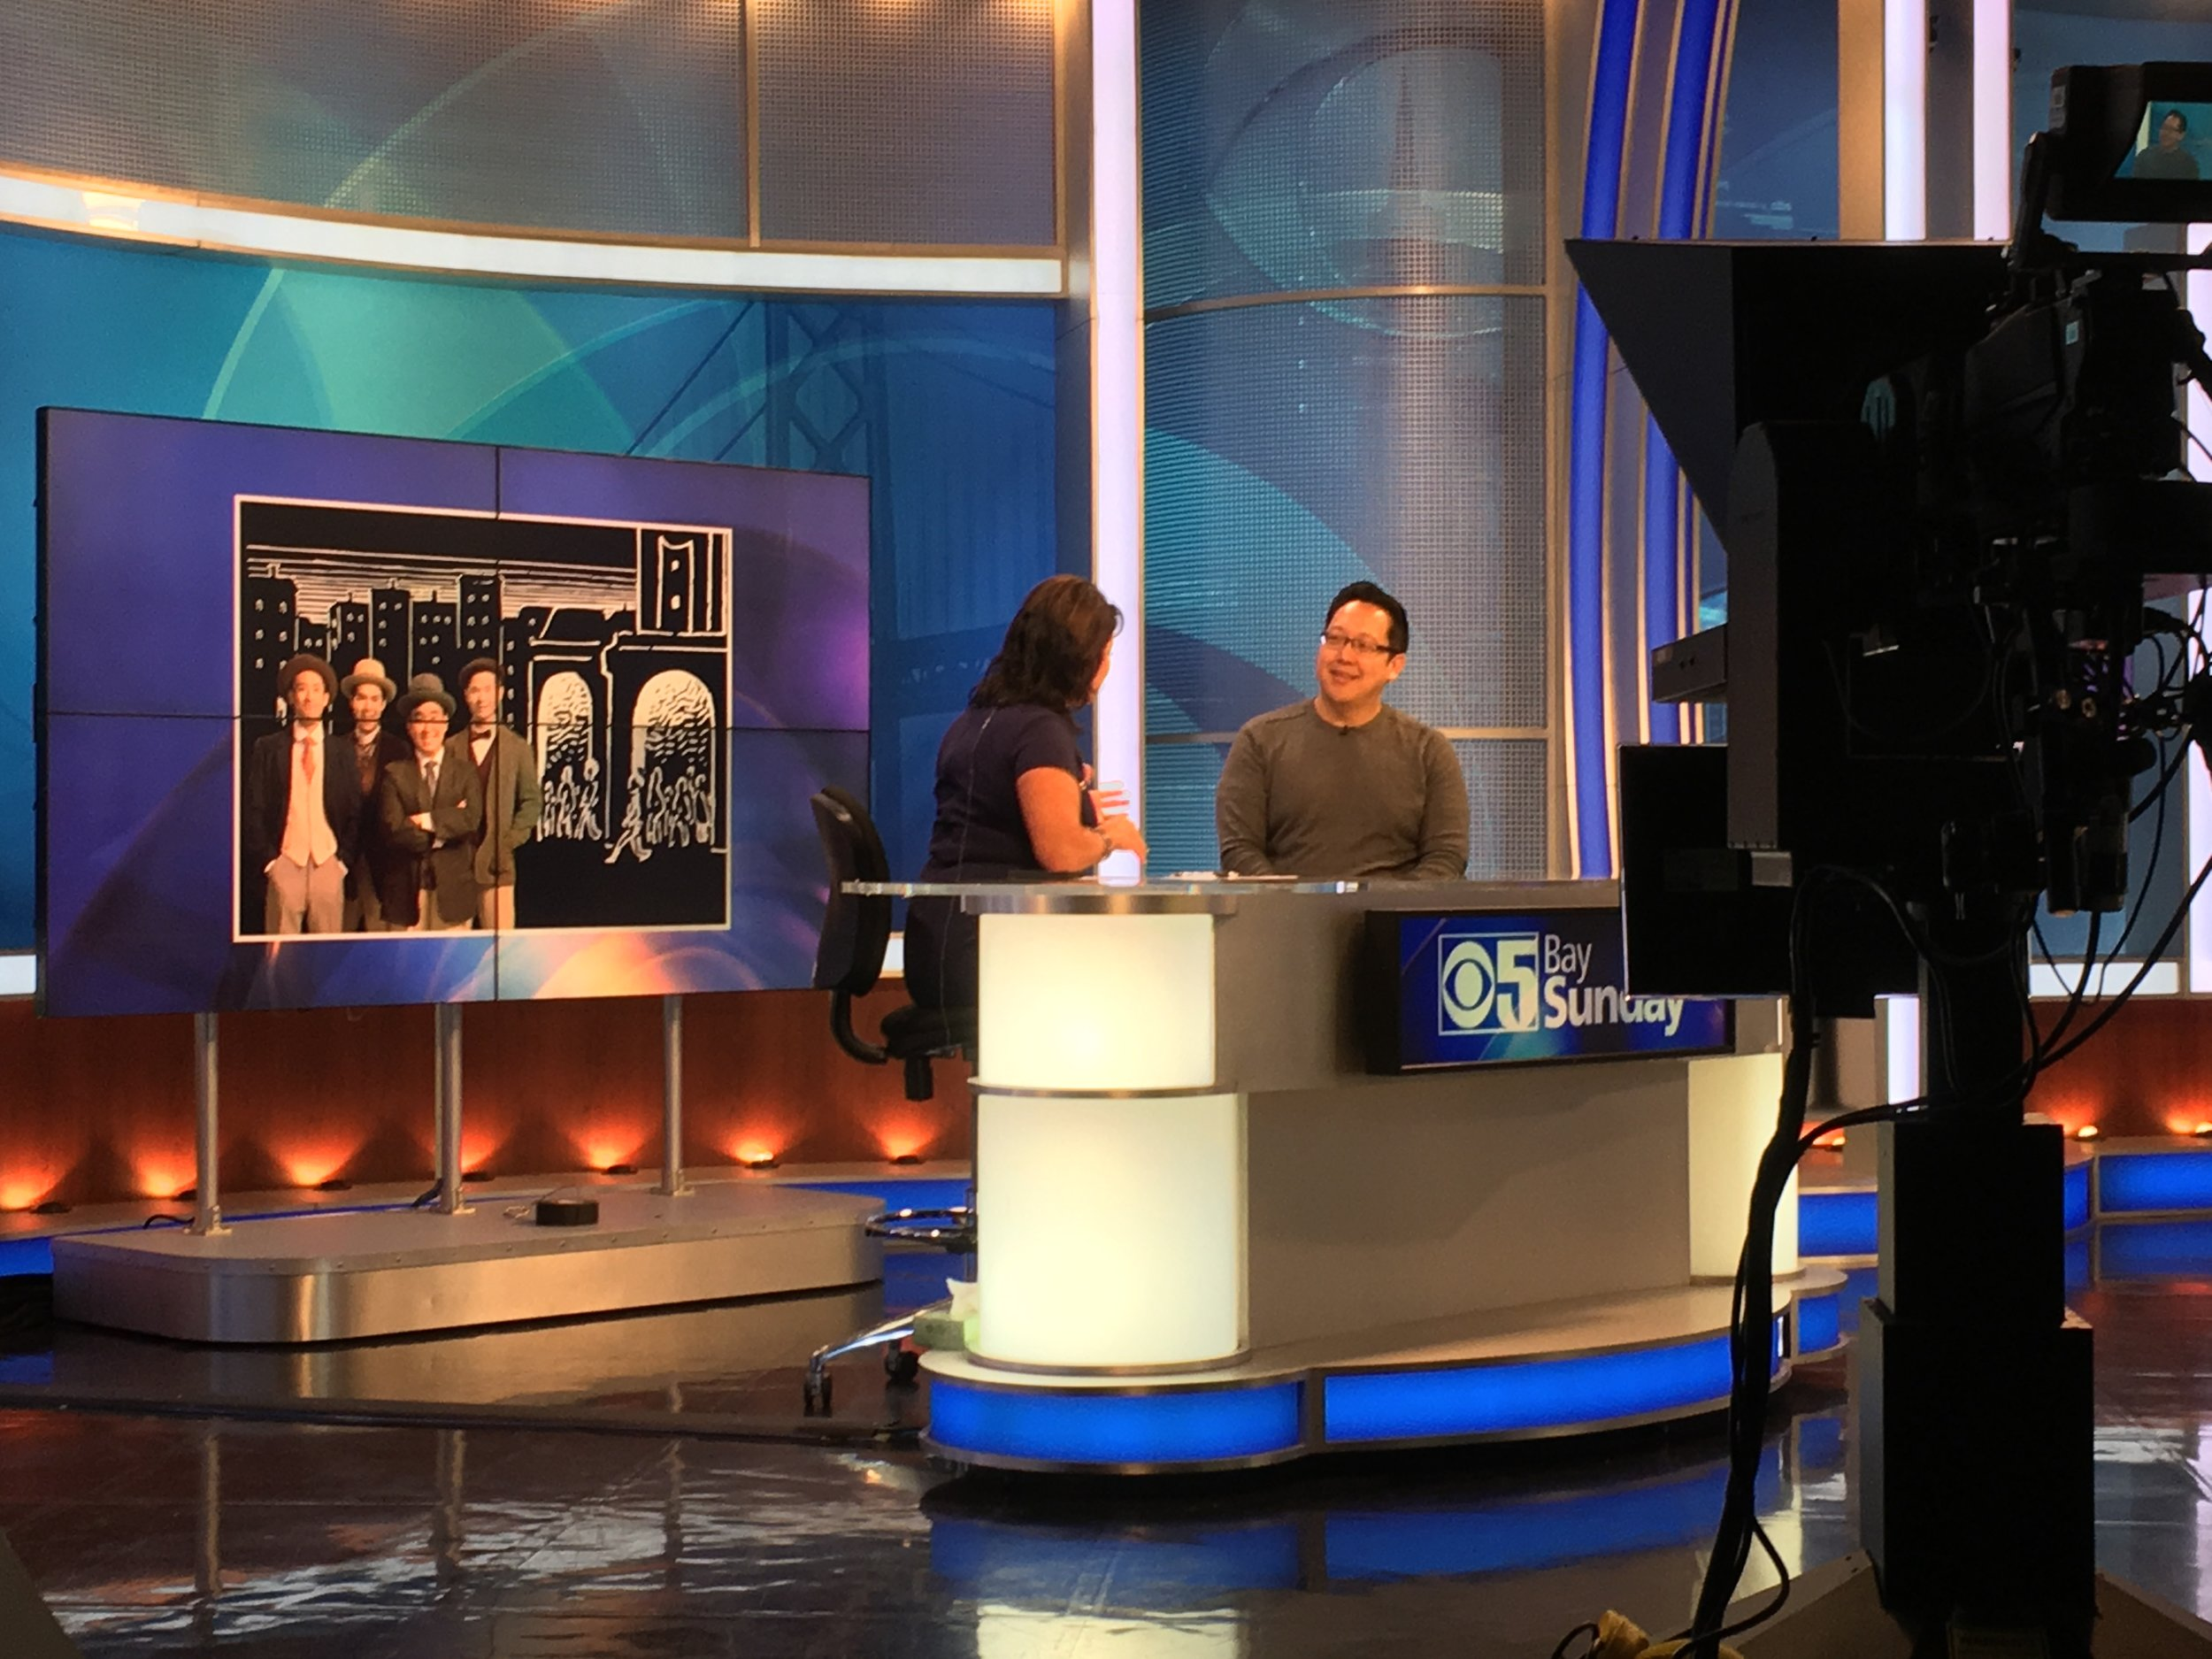 Interviewed by Roberta Gonzales.